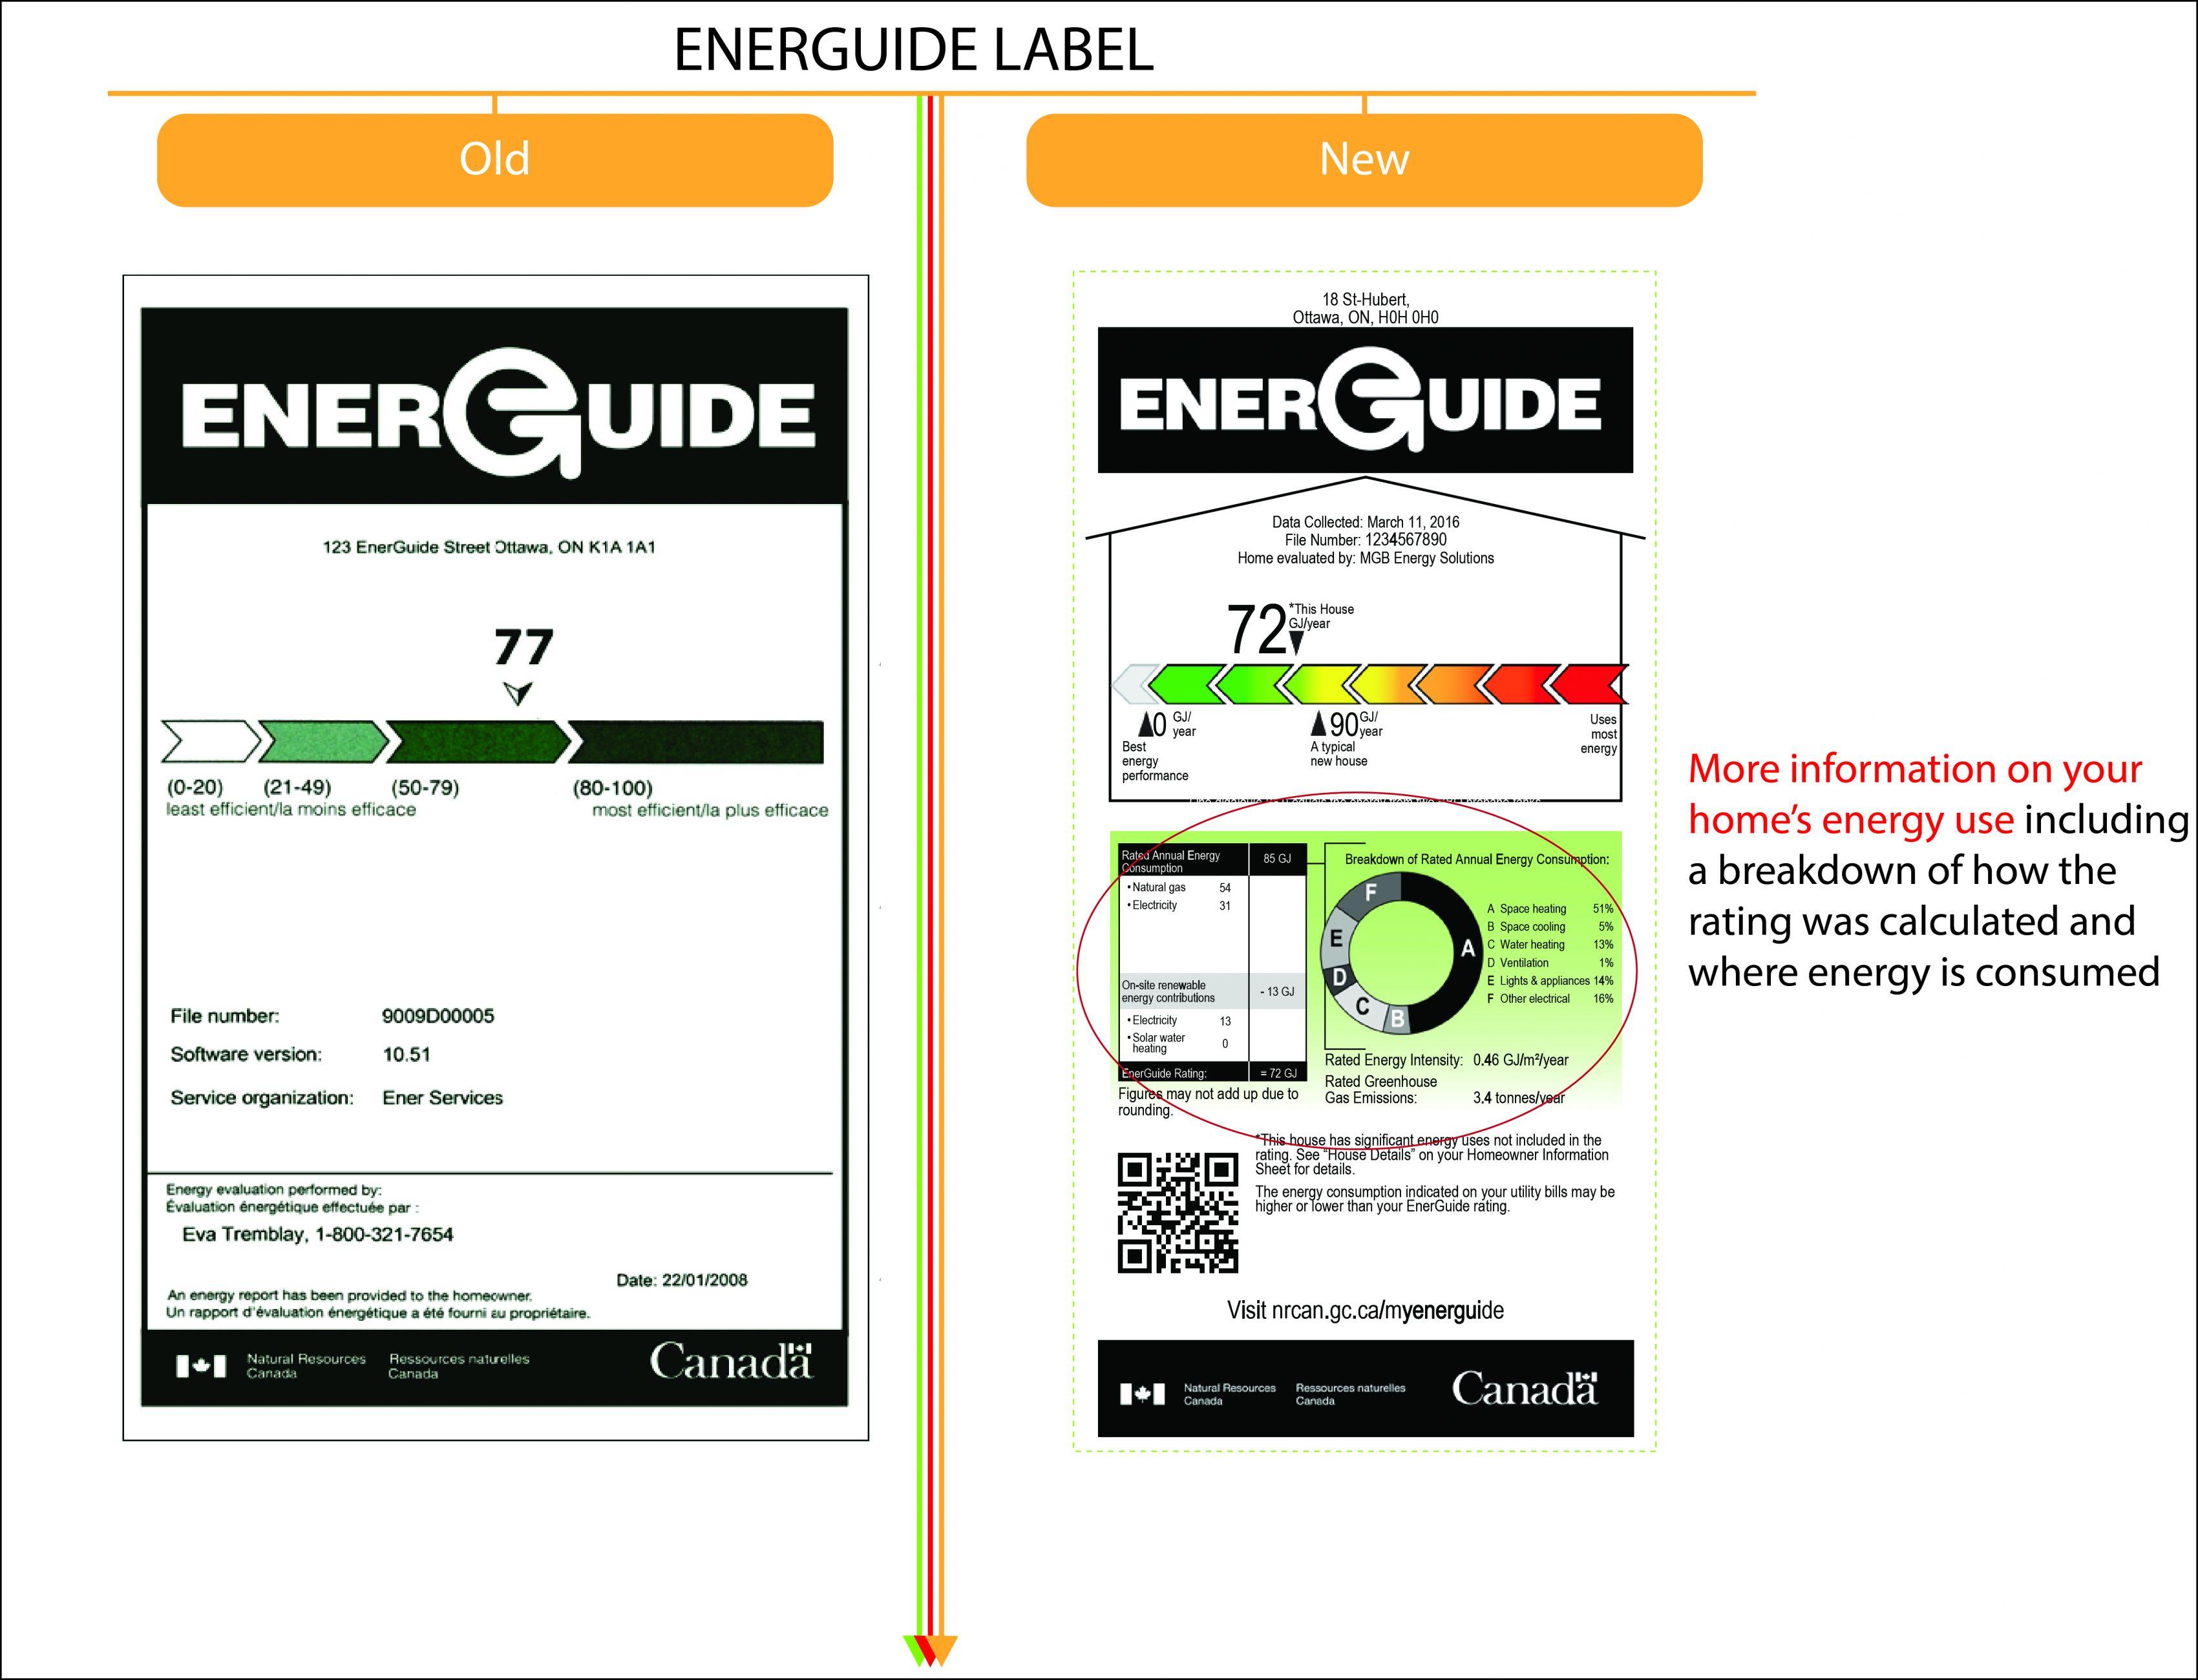 EnerGuide Label old new comparison